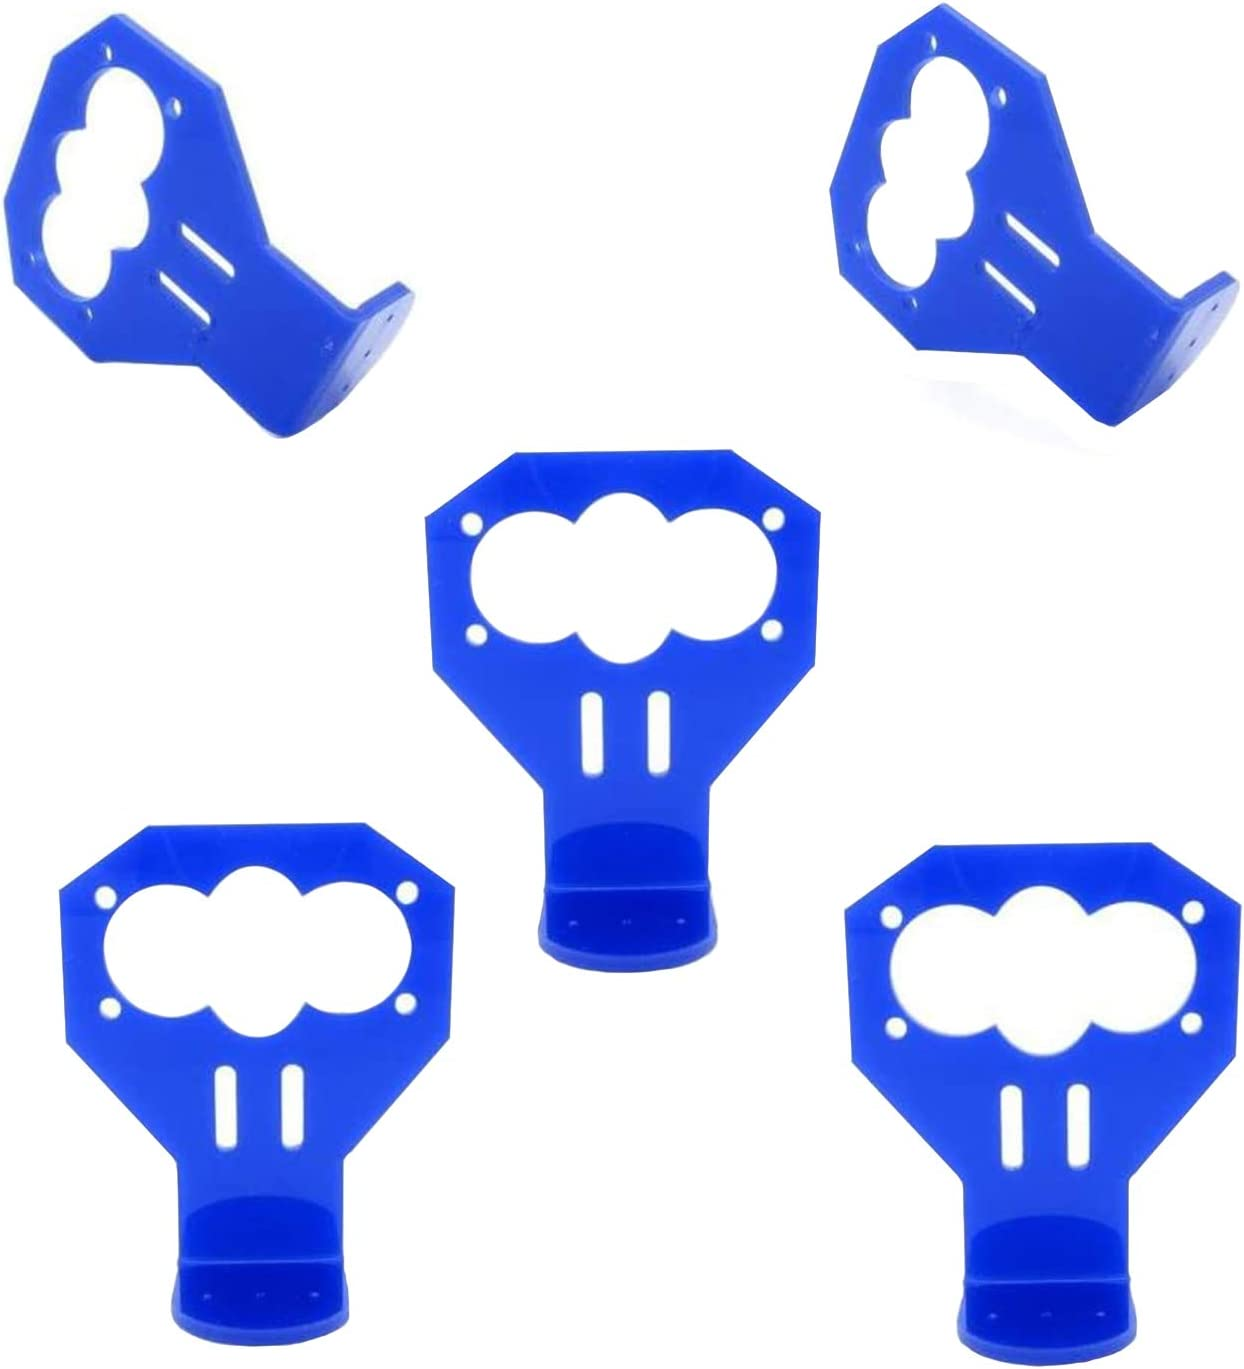 ZHITING 5 Piezas Kit de Soporte de Montaje de Sensor de Distancia ultras/ónico de Dibujos Animados Azul HC-SR04